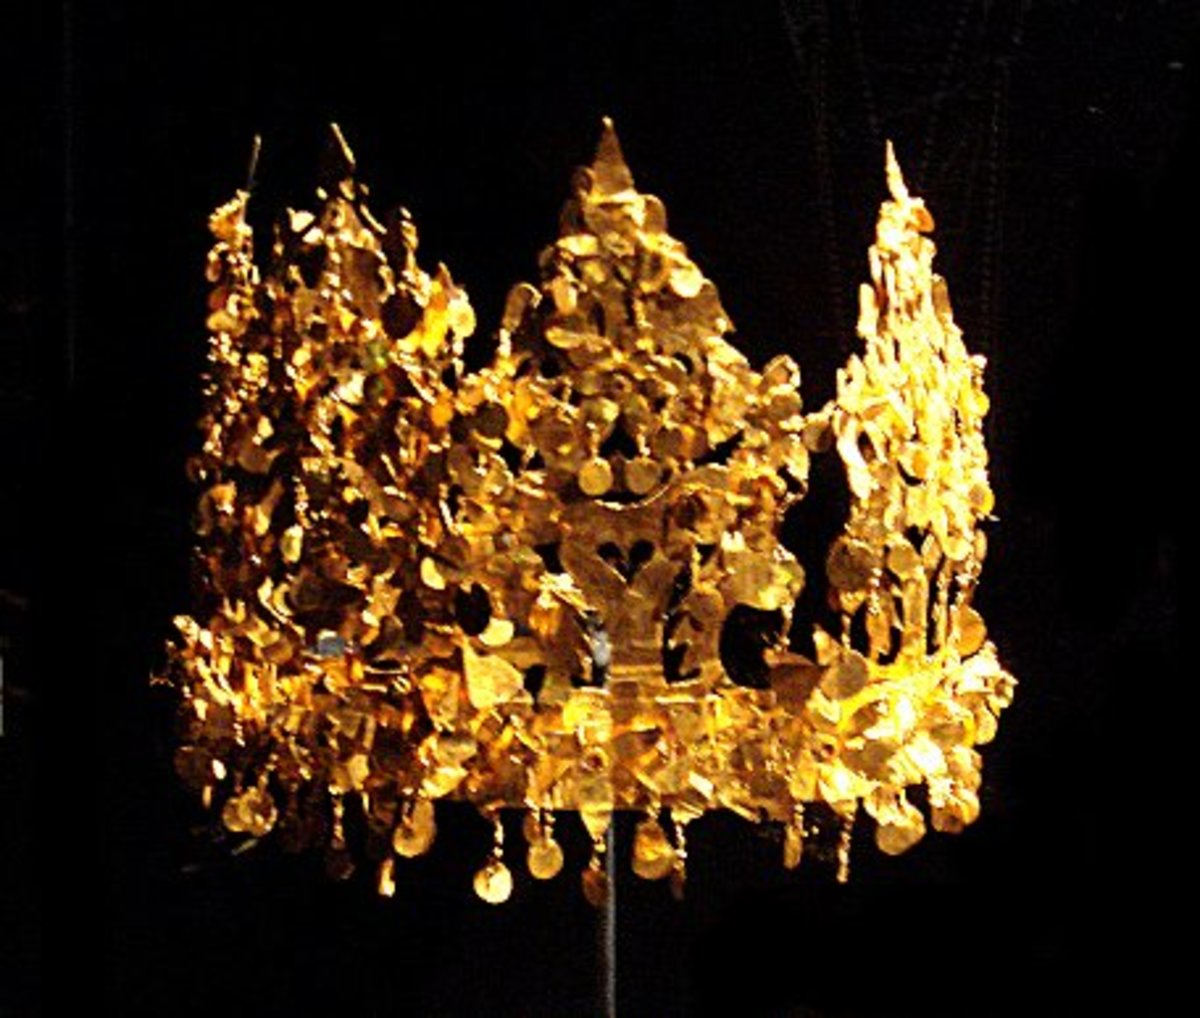 Scythian Crown